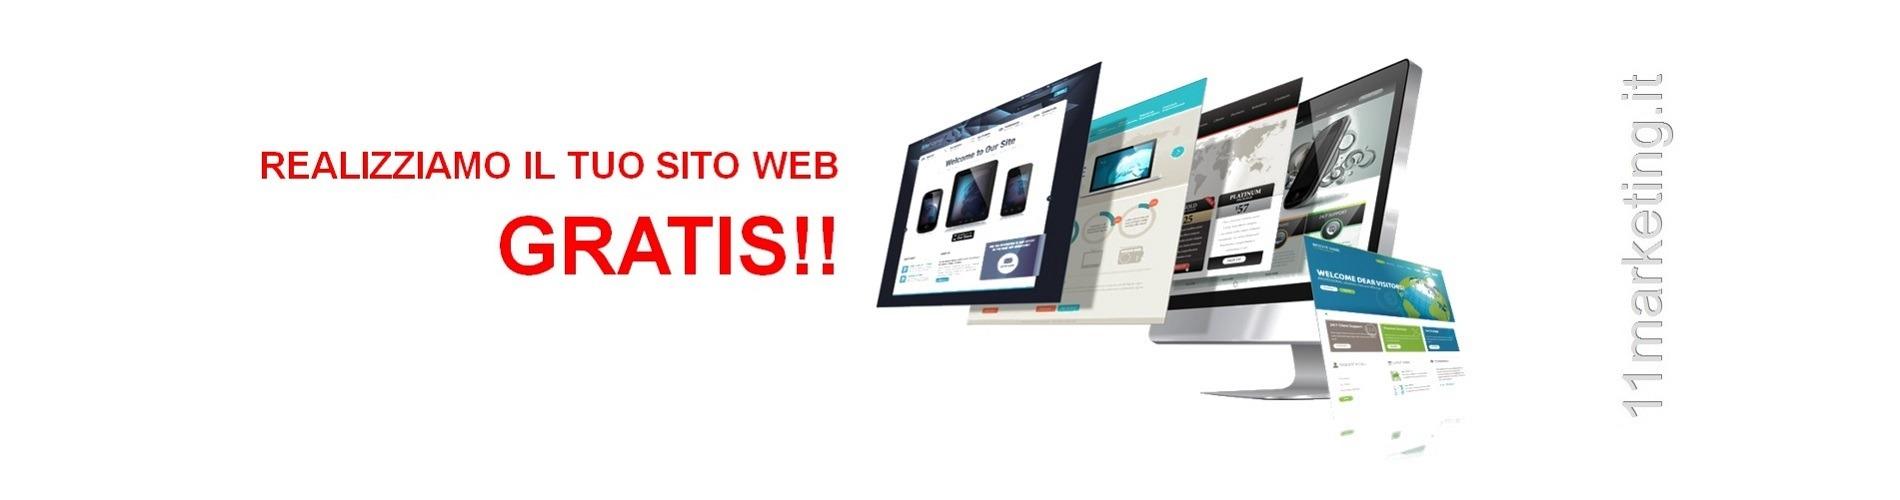 siti web gratis Roma